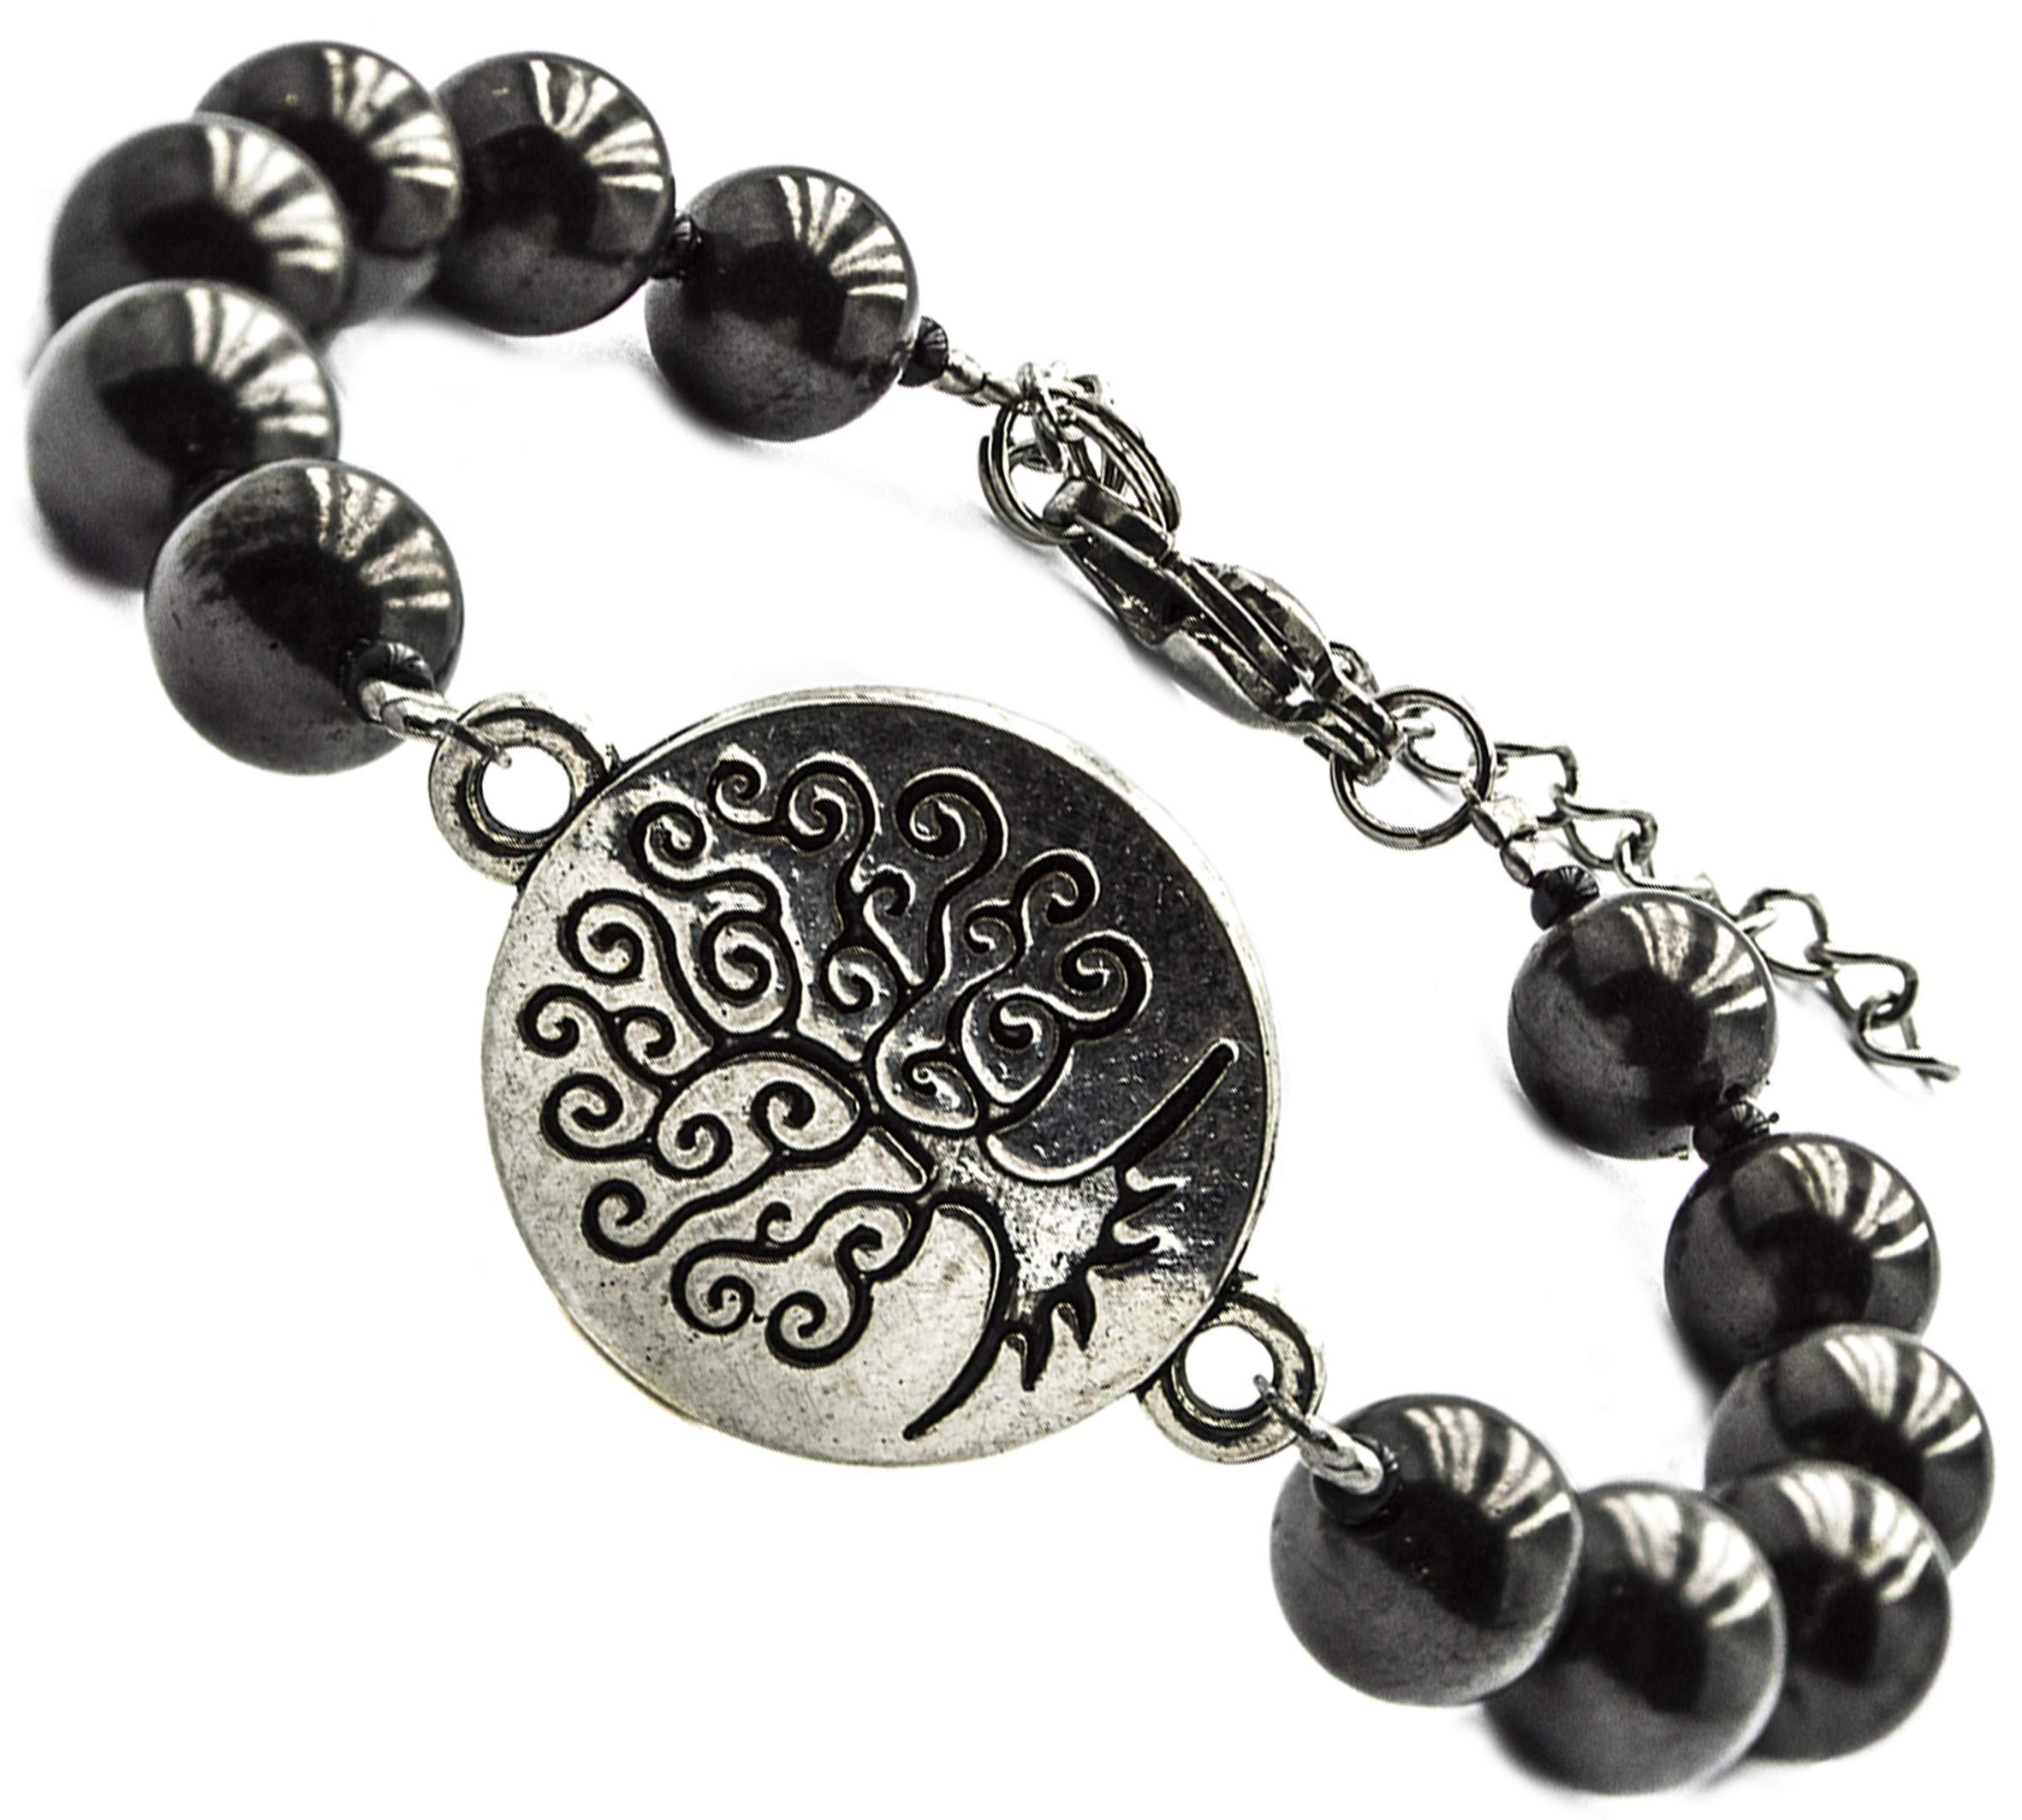 Bead Stretchy Bracelet TREE of LIFE Natural Black Shungite 8 mm